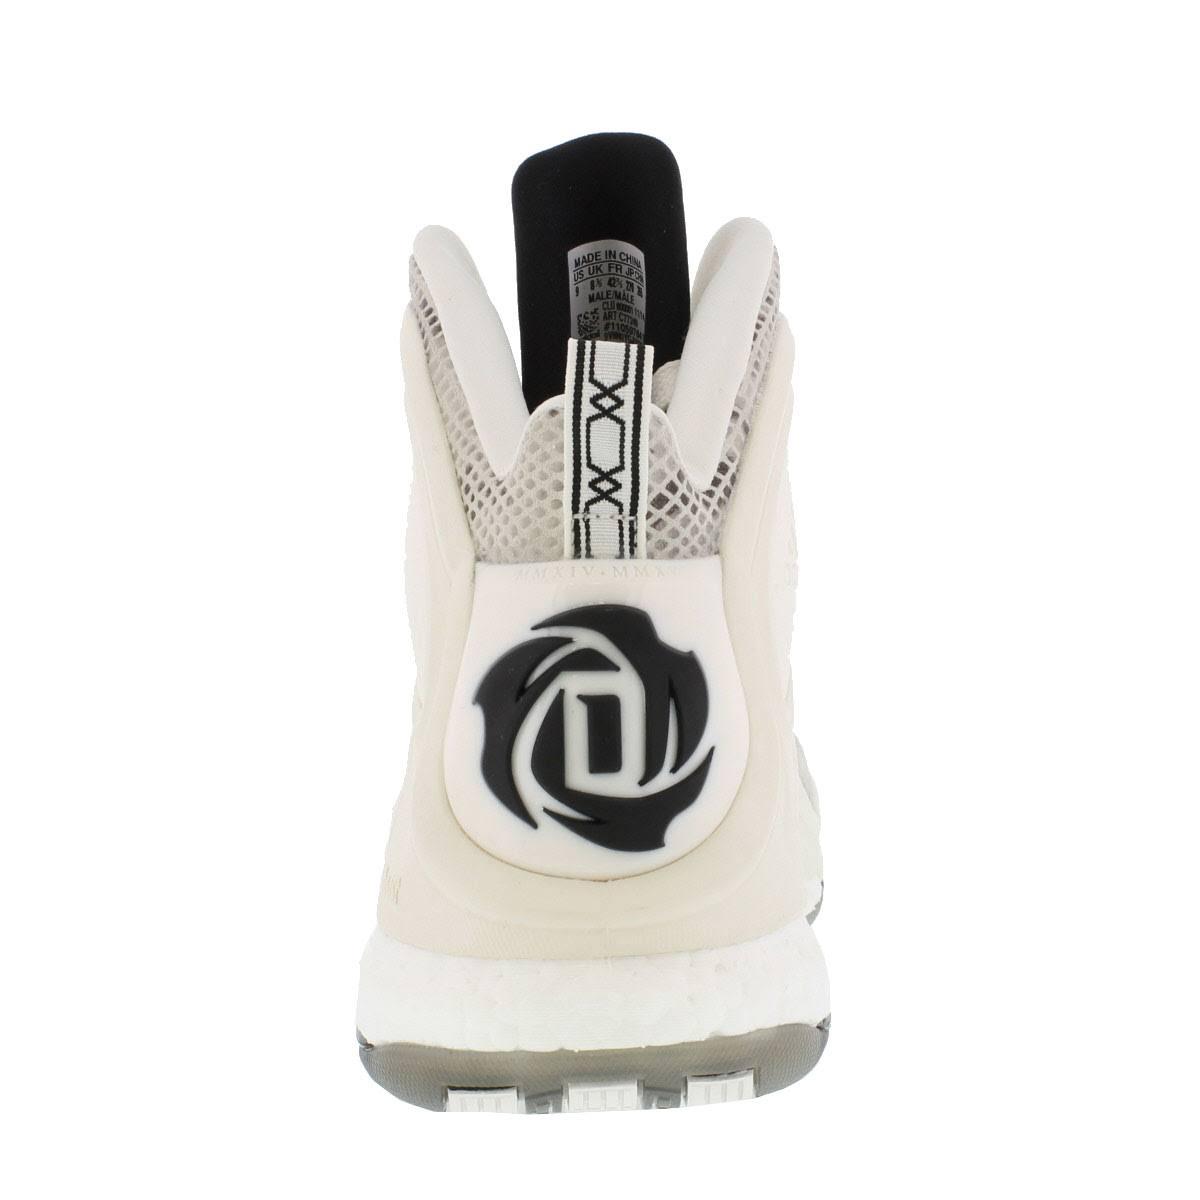 Boost Baloncesto Performance De Hombre Para D Zapatillas Adidas Rose 5 6qAxw7